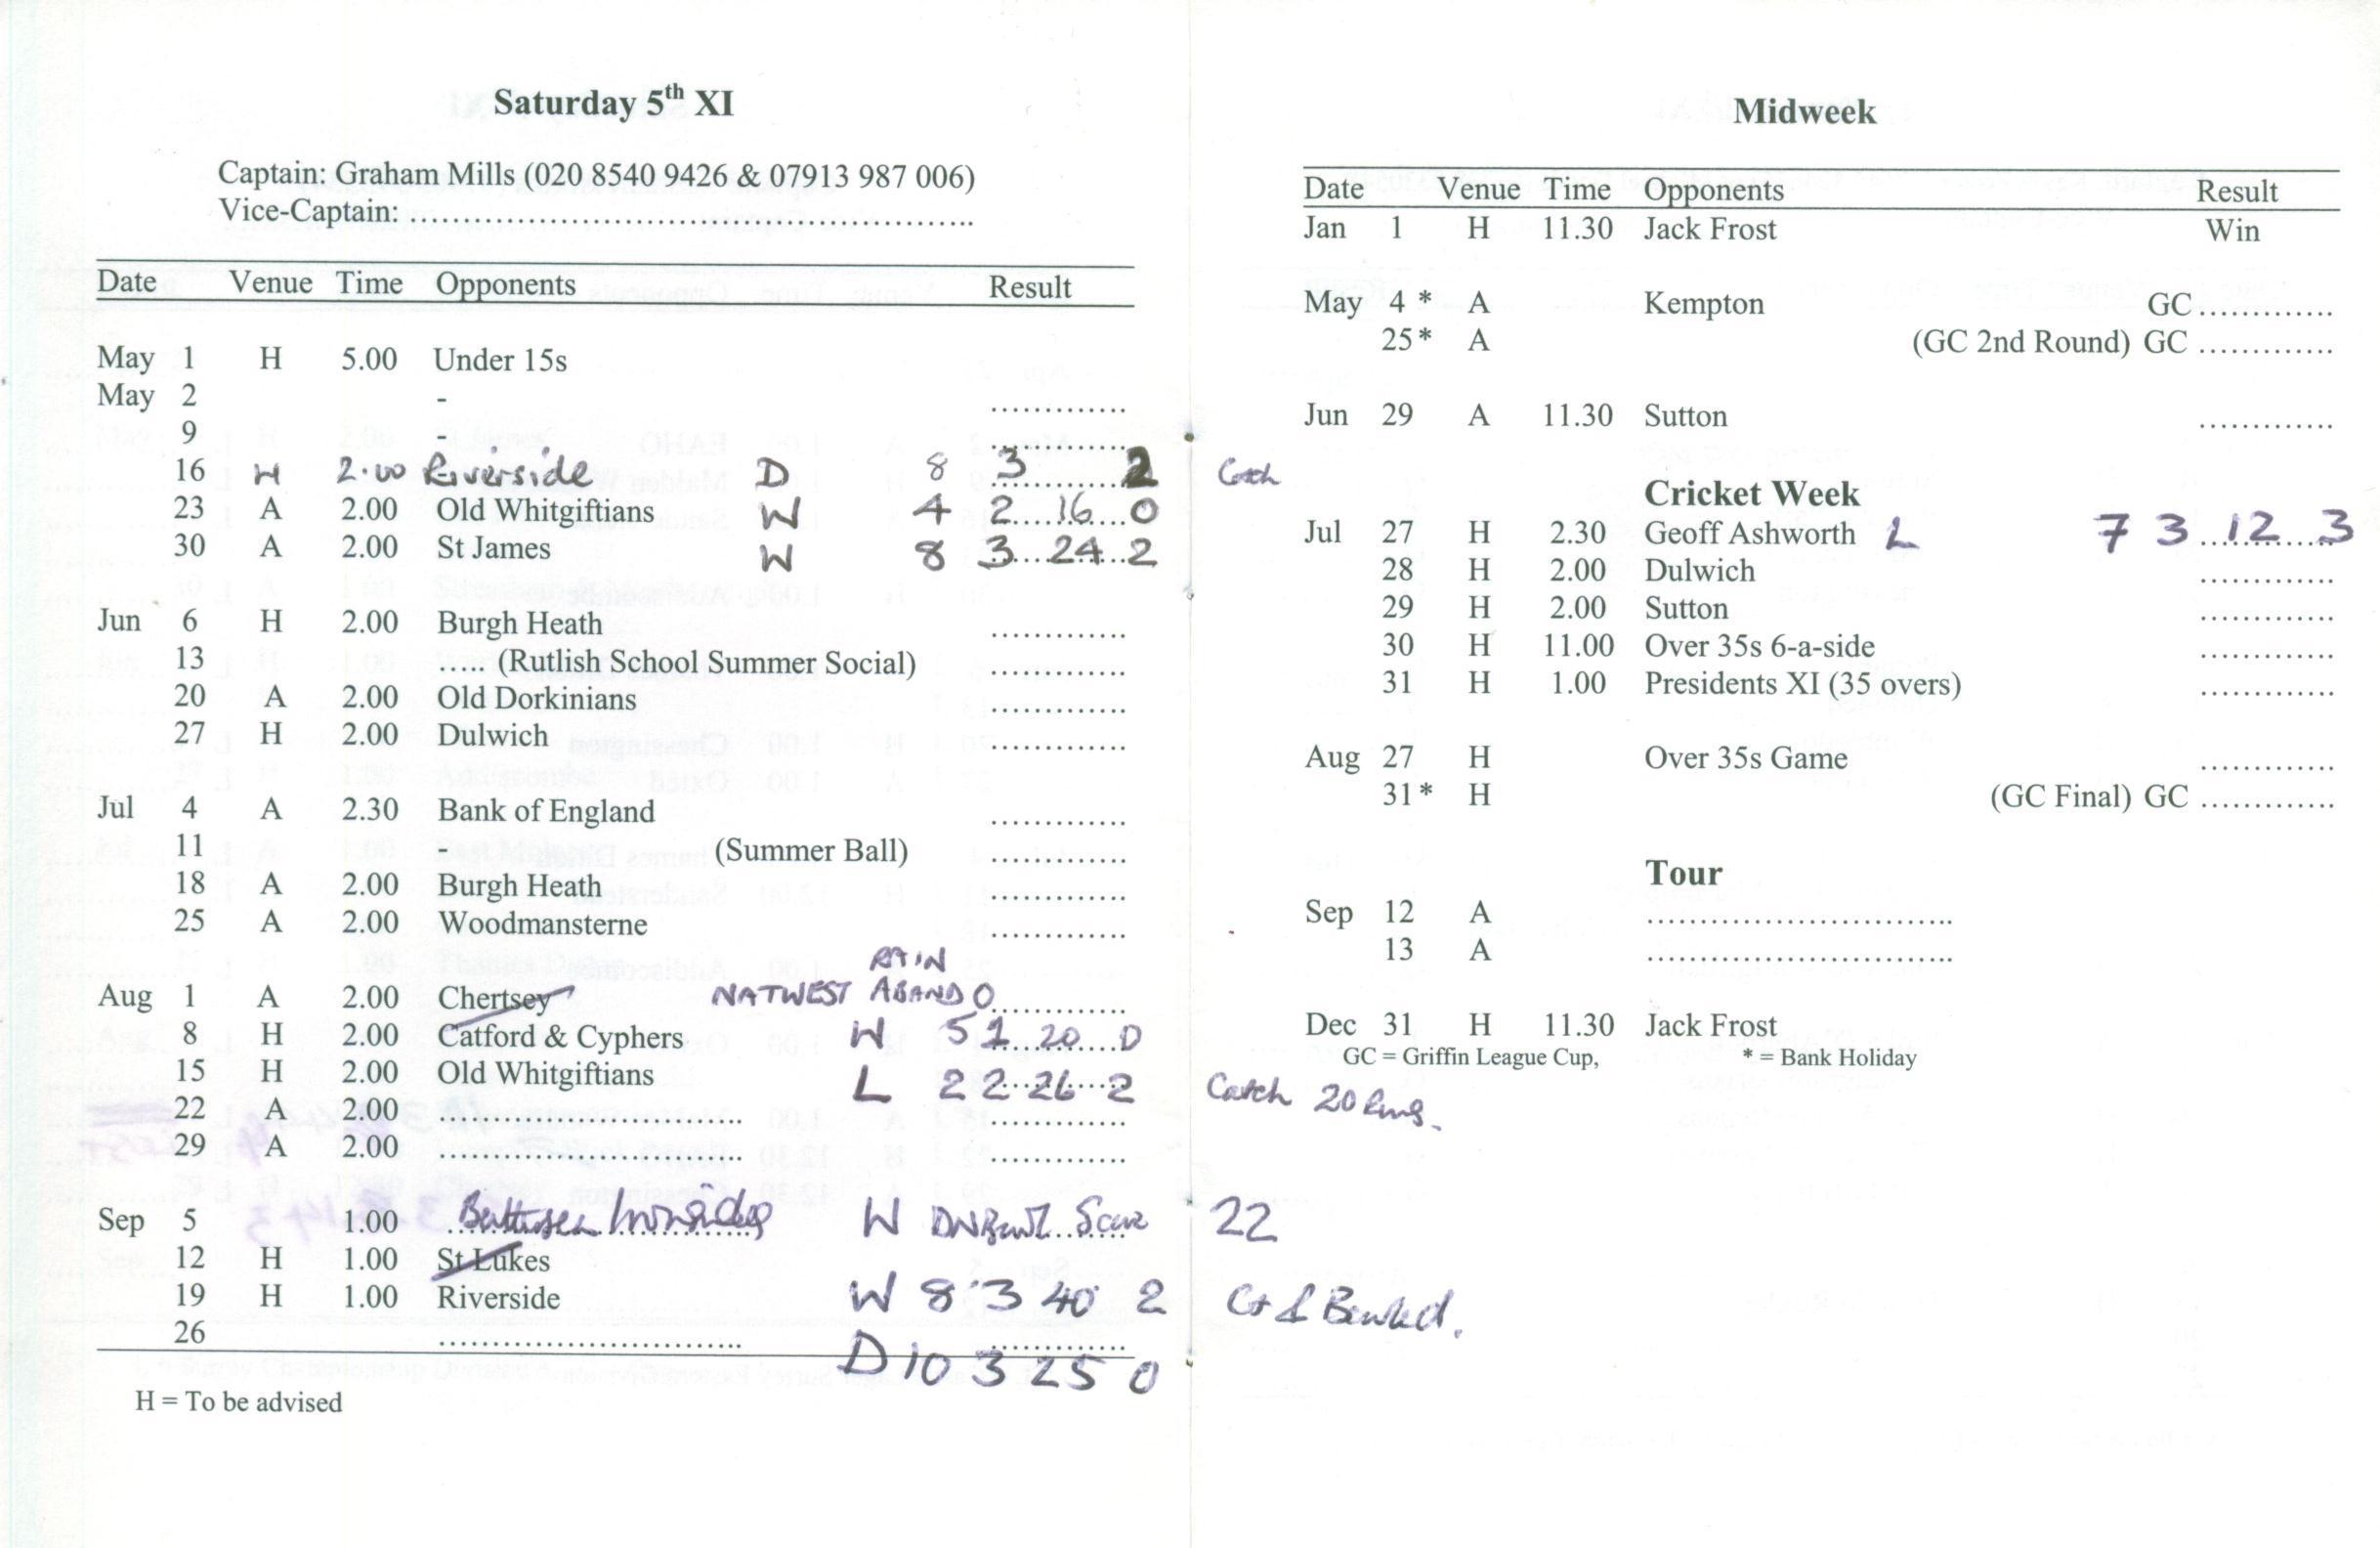 2009 5th XI & Cricket Week Results